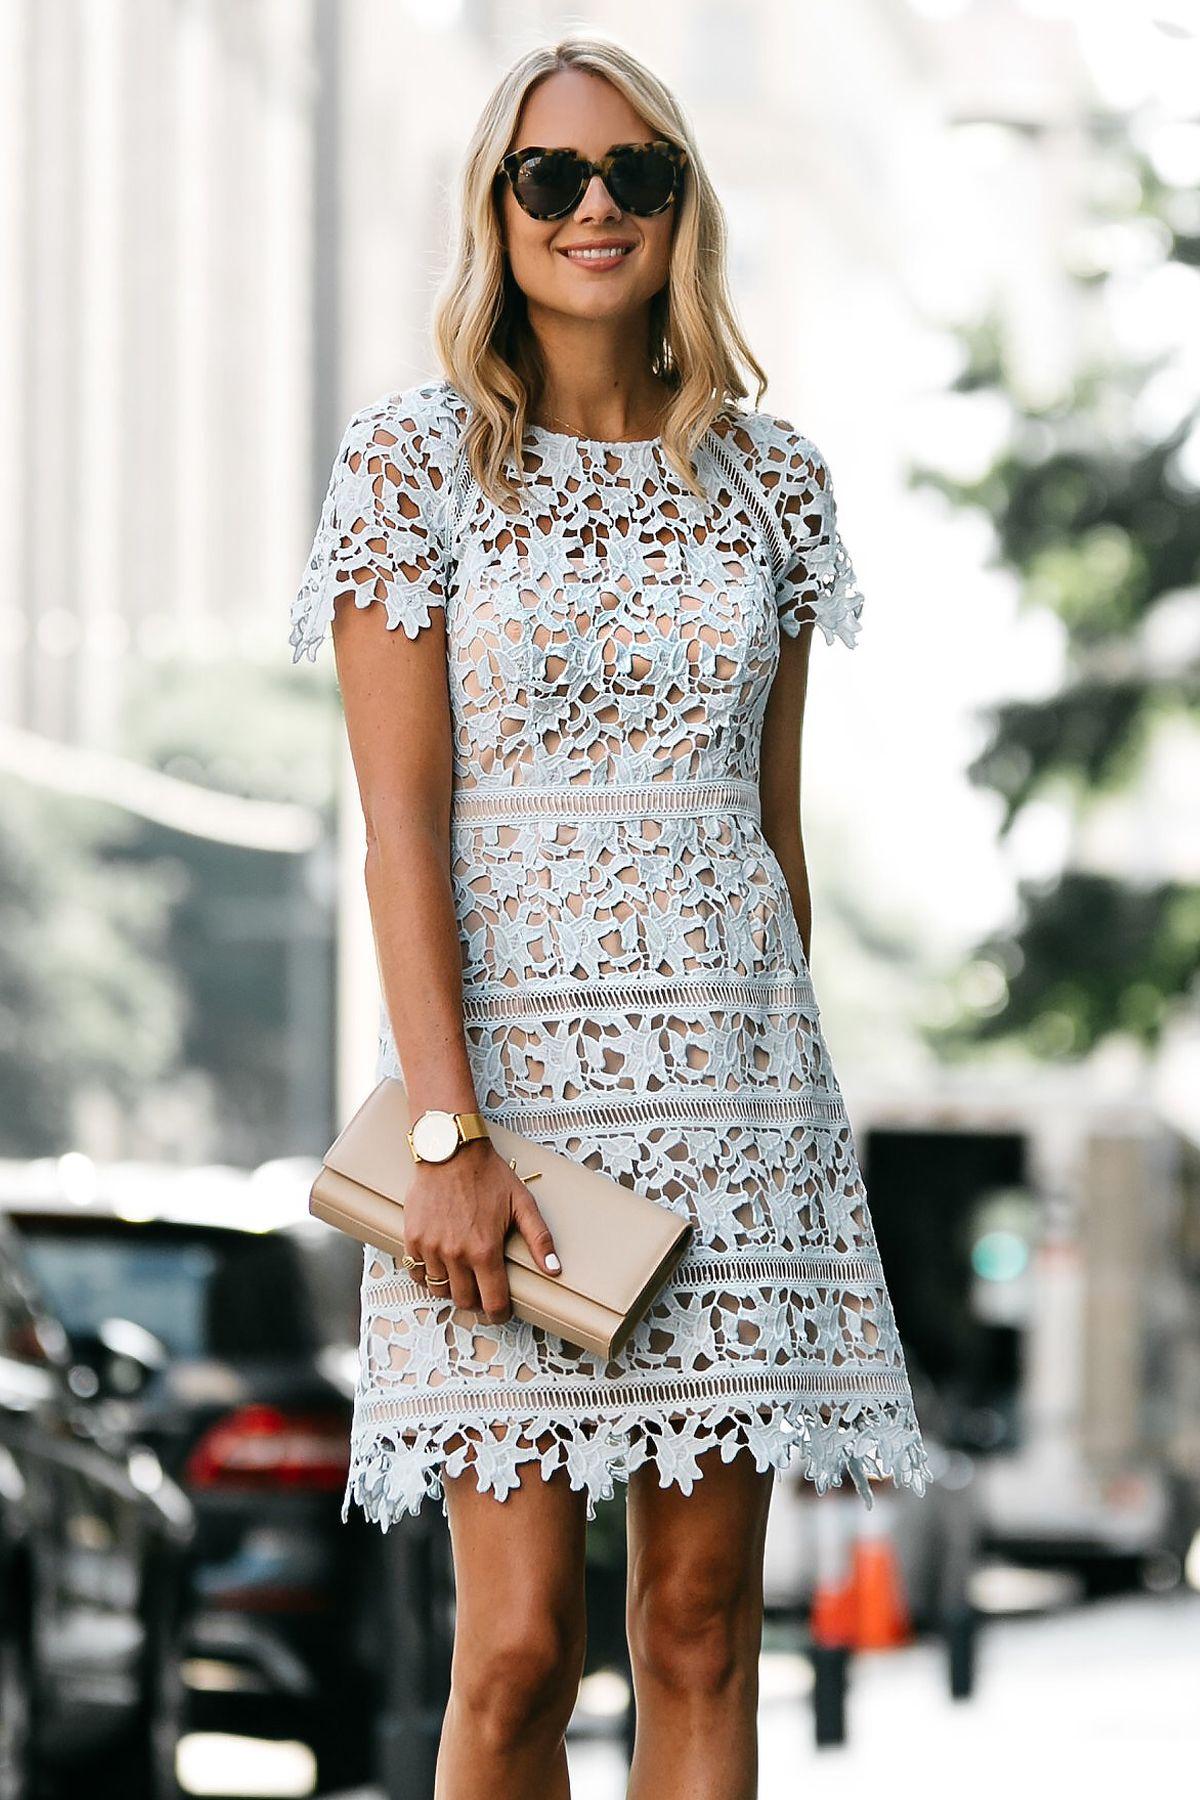 e74fc66ba557 Fashion Jackson, Dallas Blogger, Nordstrom Short Sleeve Blue Lace Dress,  YSL Nude Clutch